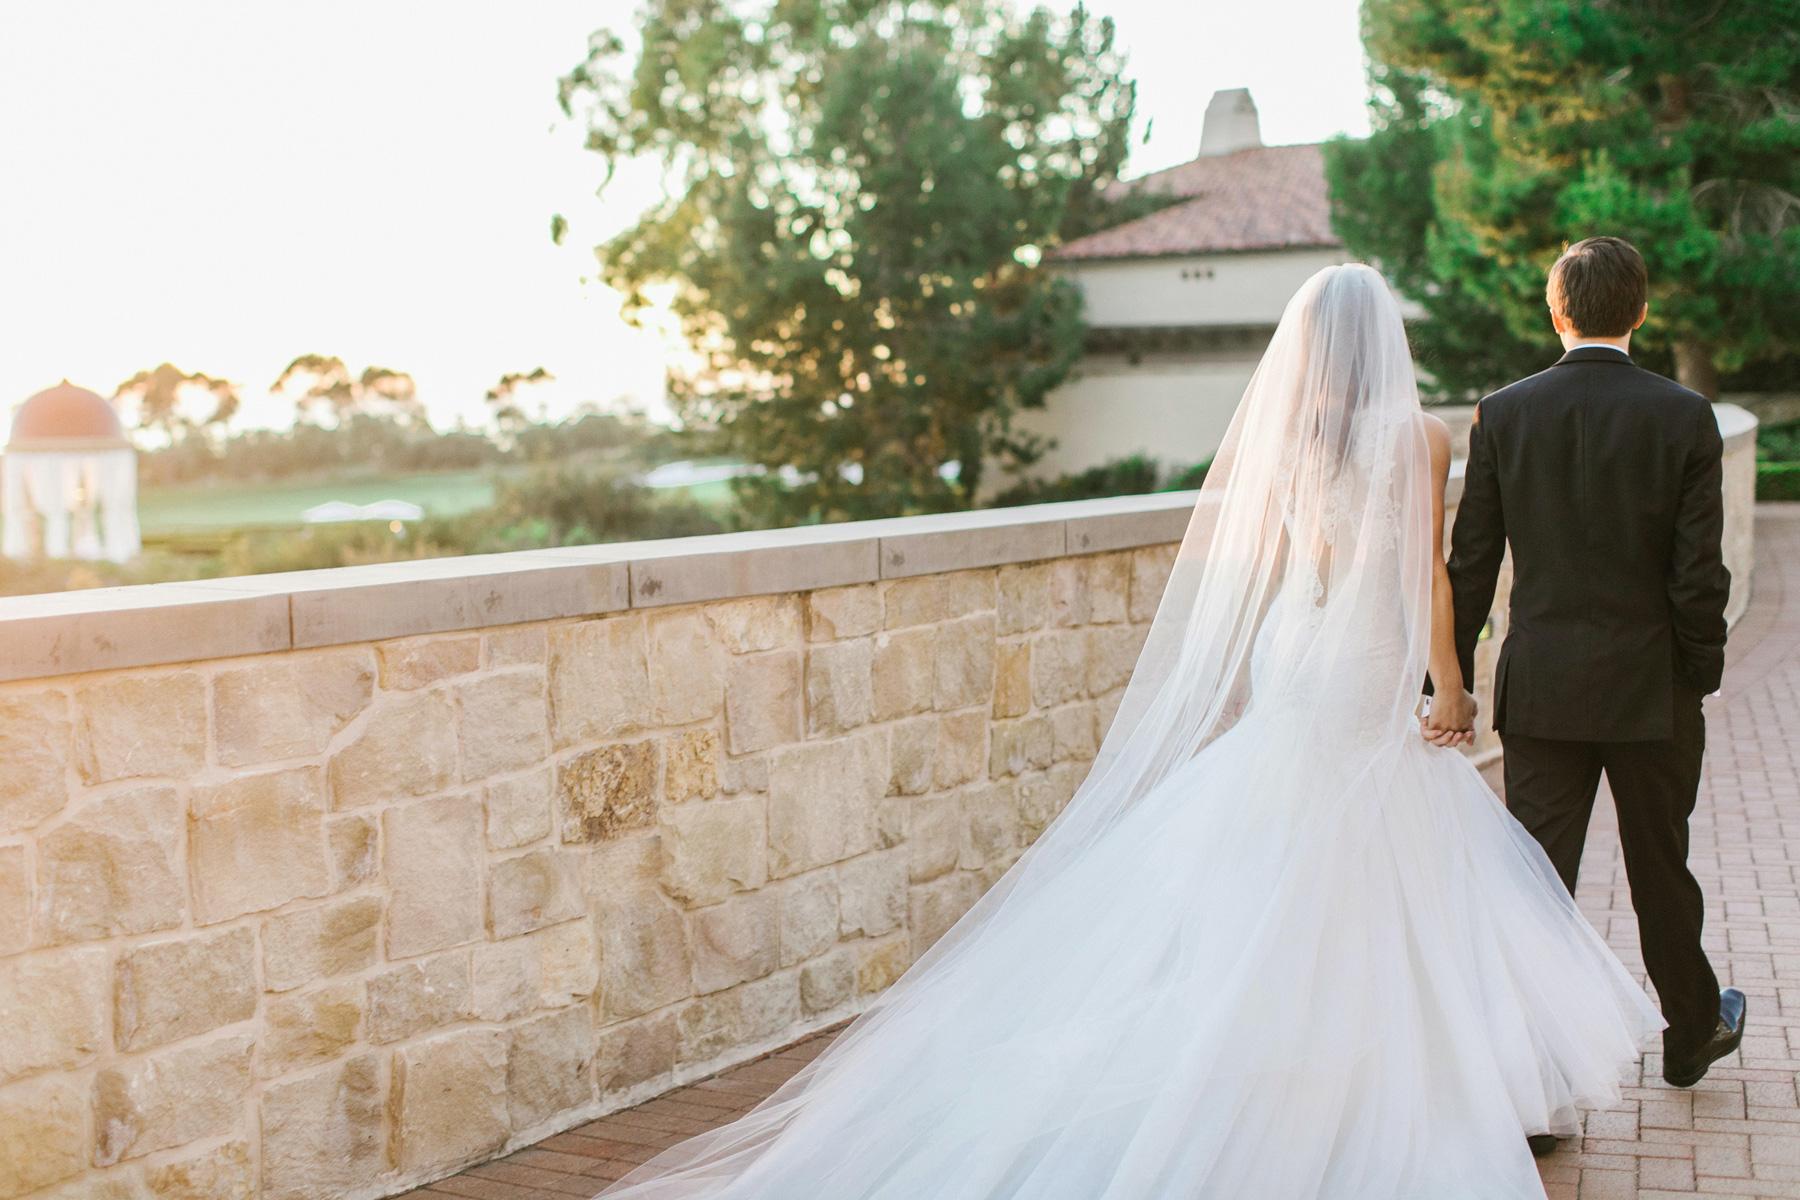 Pelican-hill-wedding-28.JPG